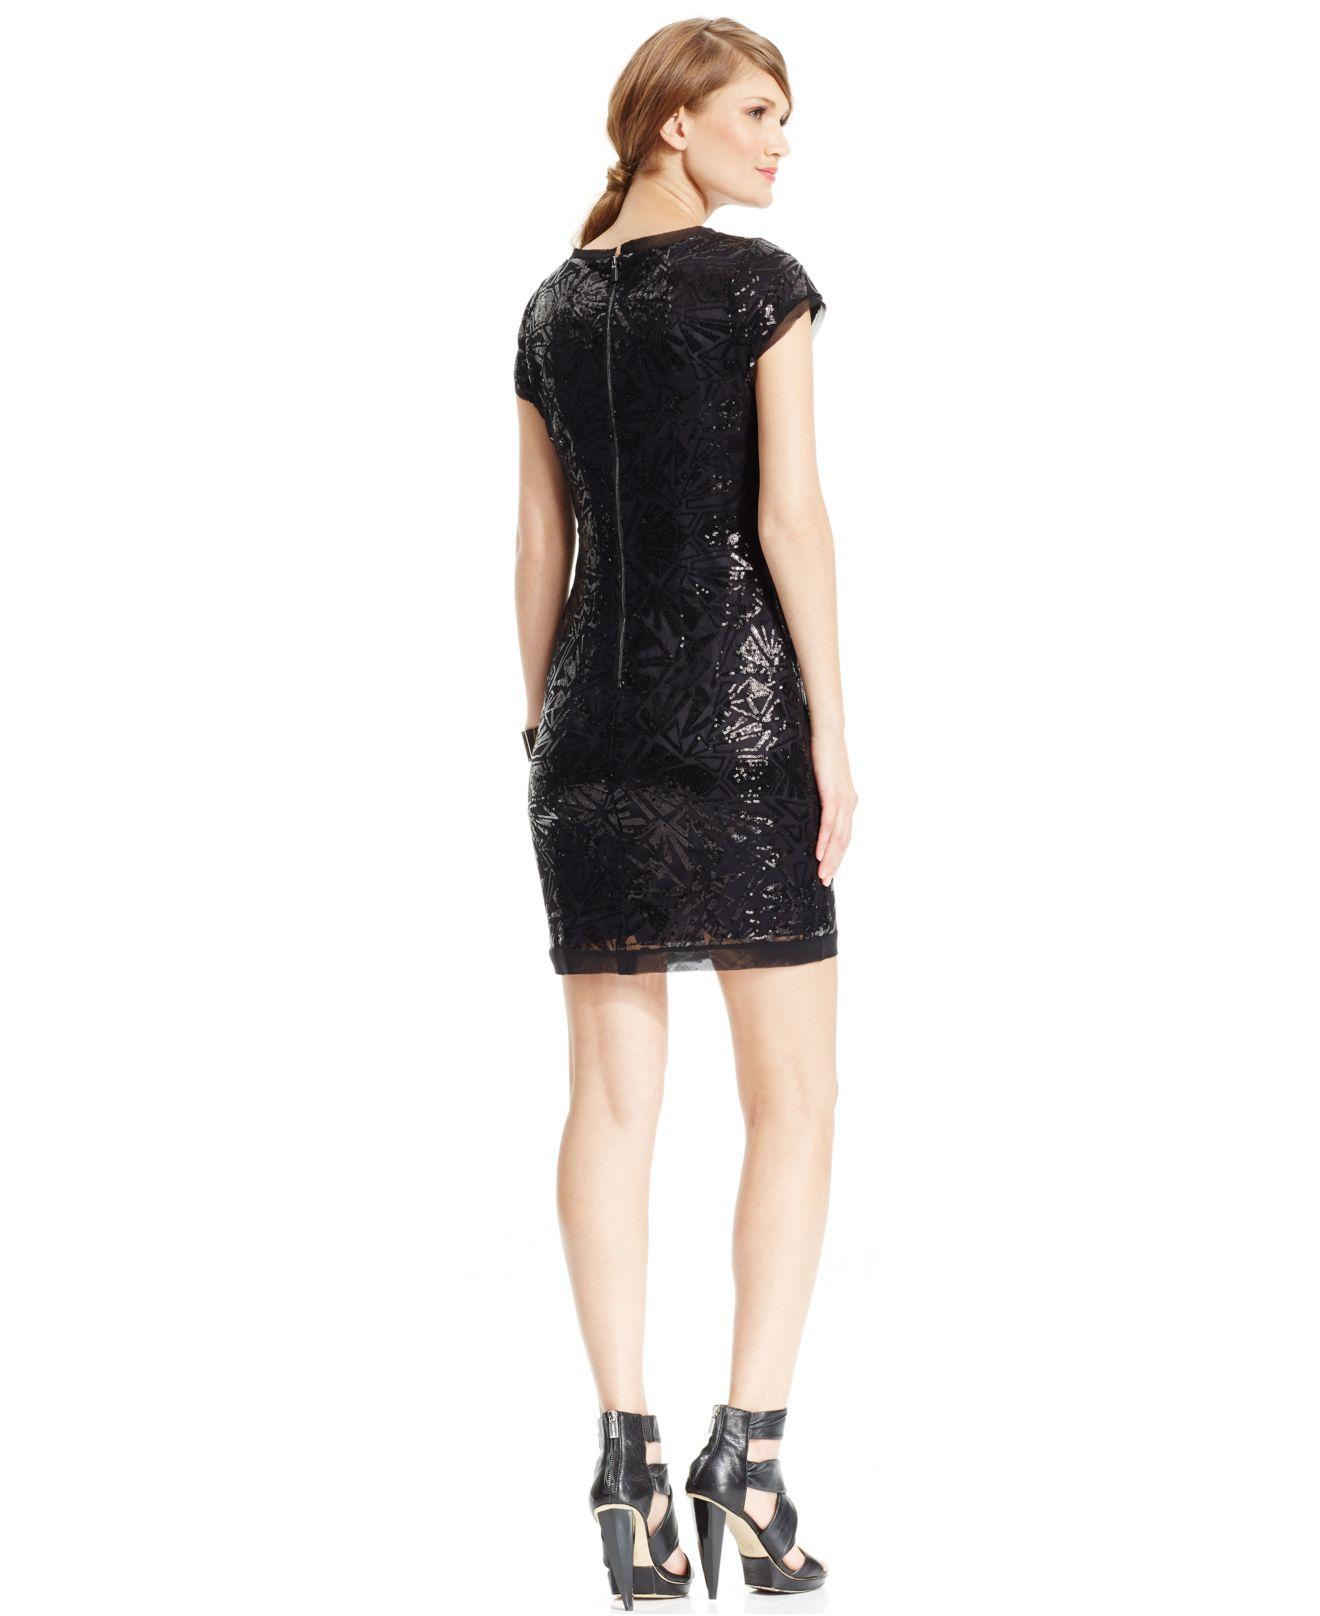 Vince Camuto Sequin Dresses | Dress images